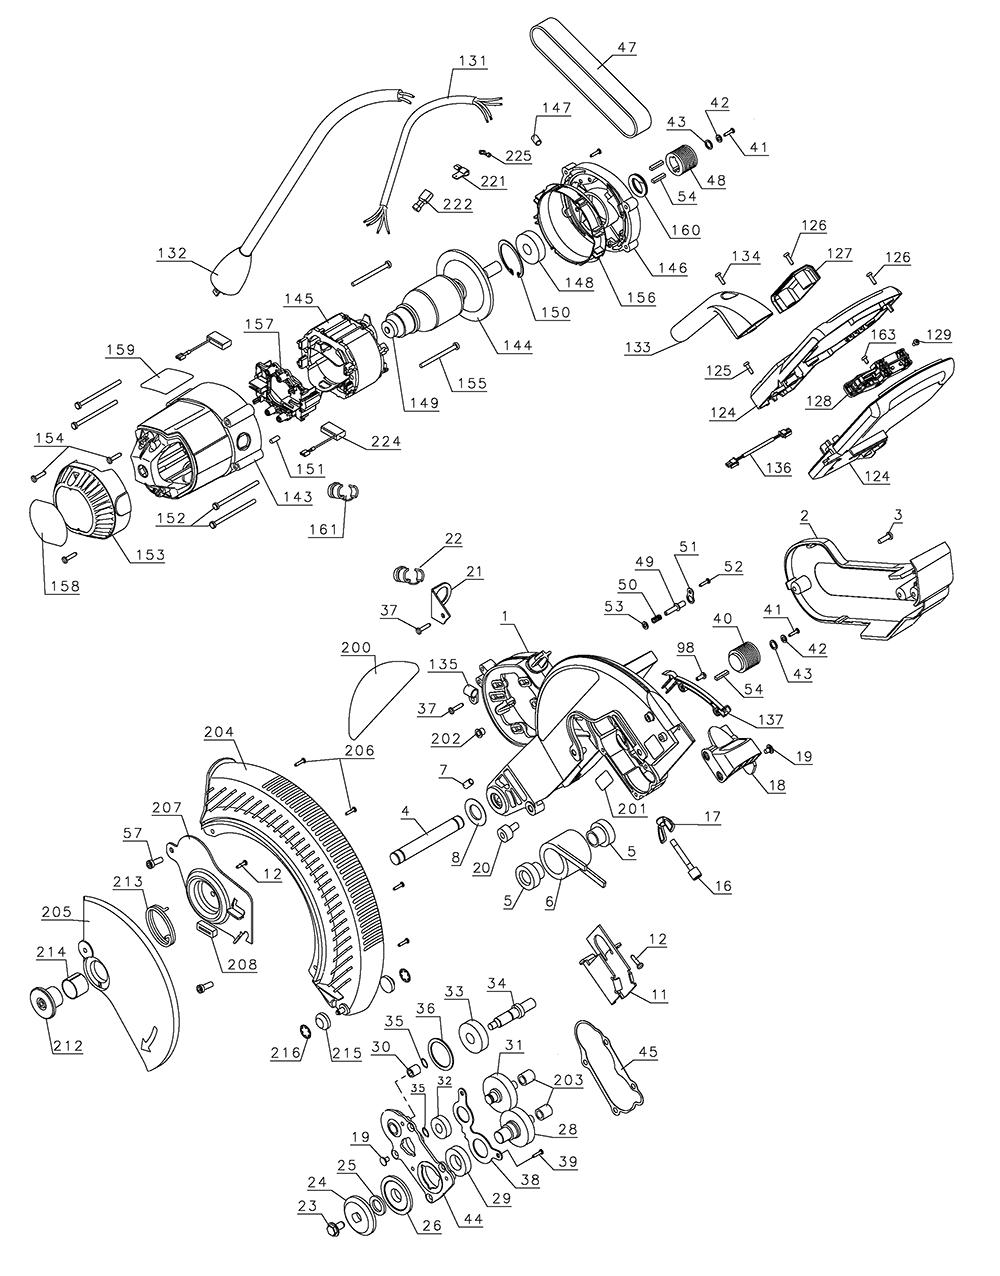 Dewalt DW718-B2-Type-1 Parts List | Dewalt DW718-B2-Type-1 Repair